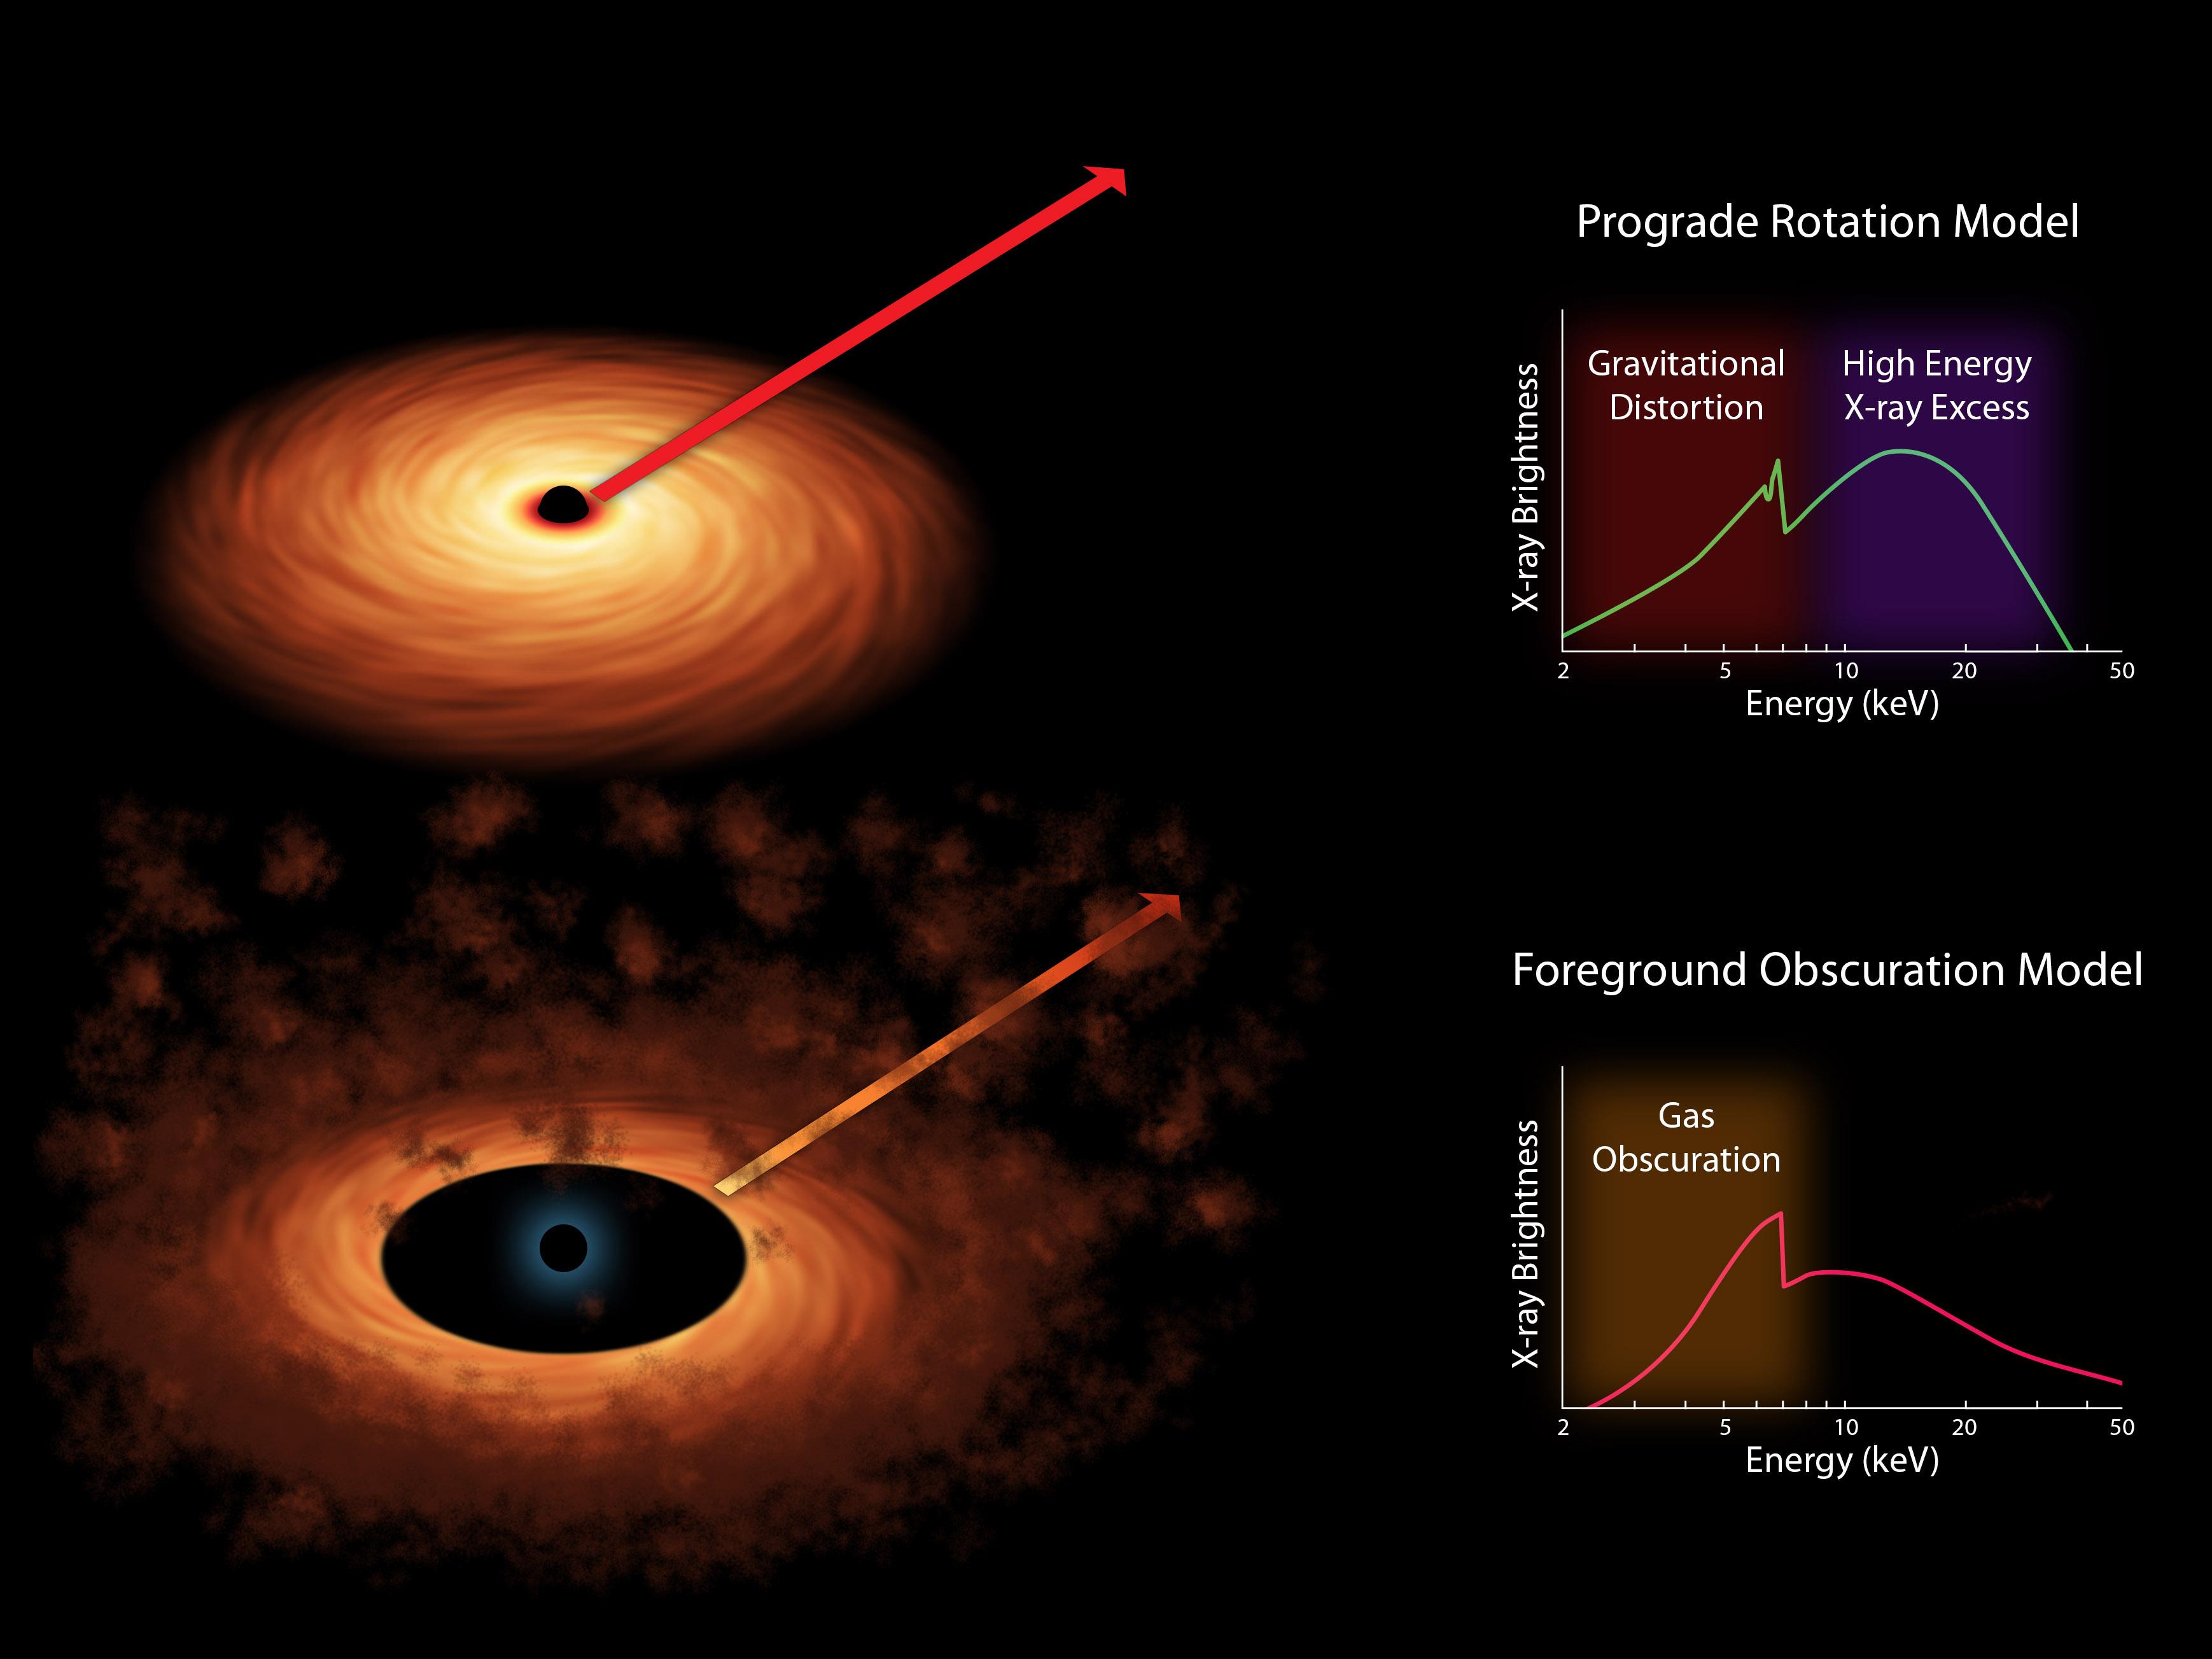 NASA - Two Models of Black Hole Spin